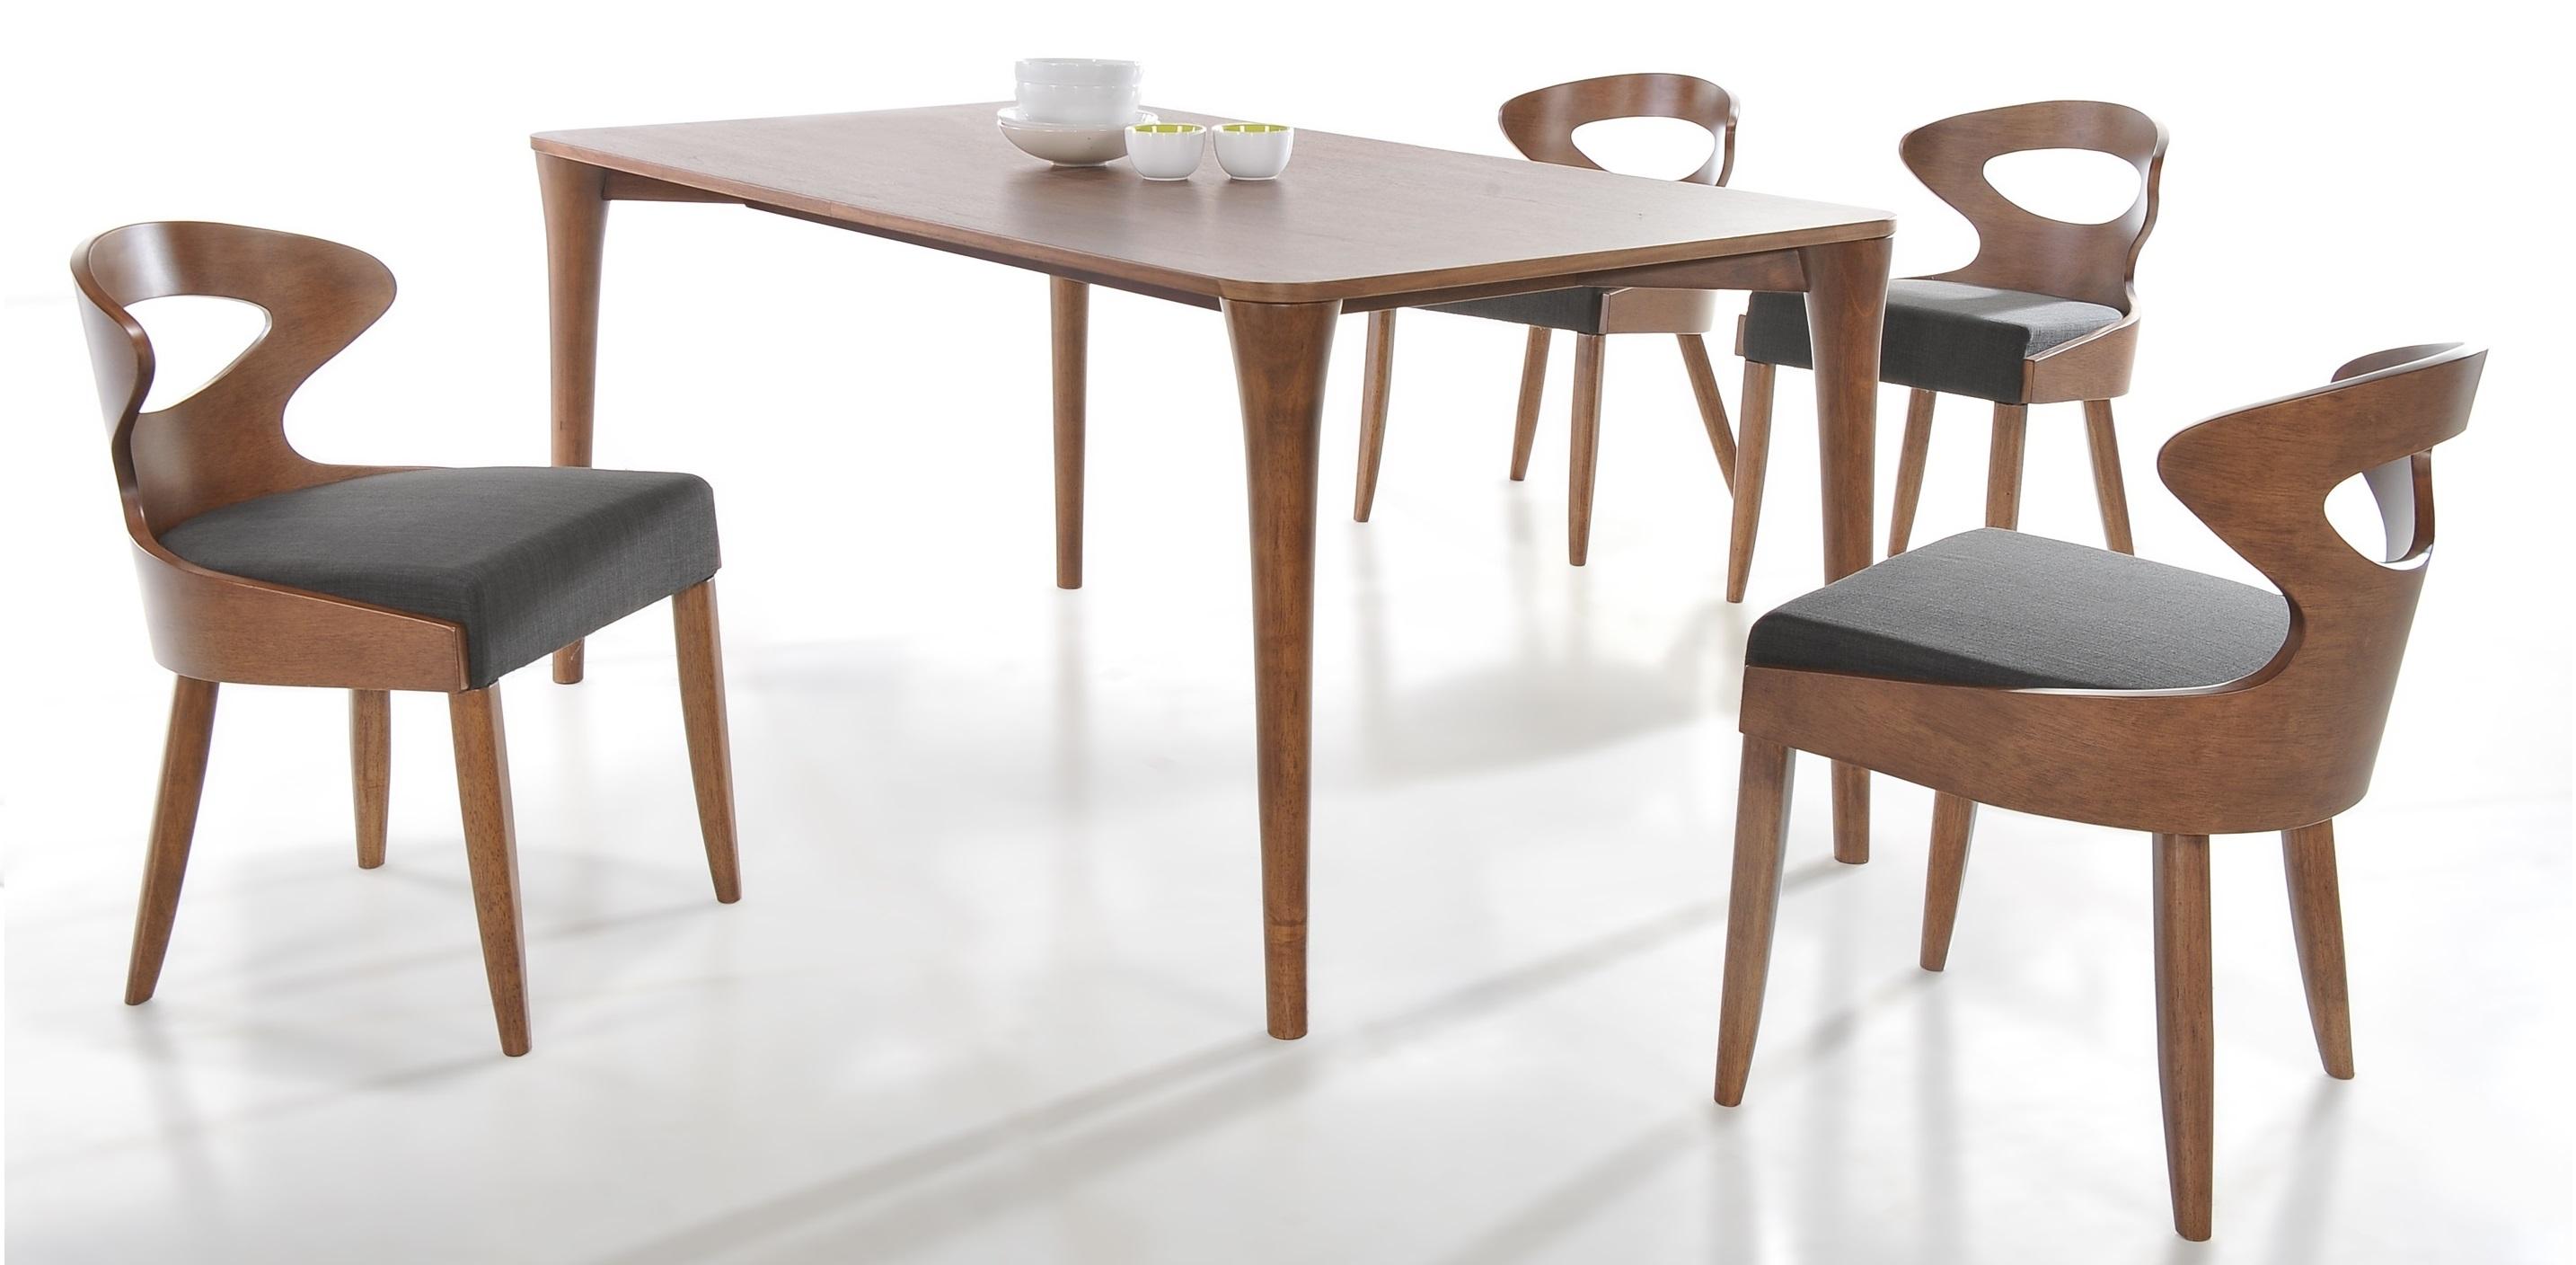 Stôl do rodinného domu